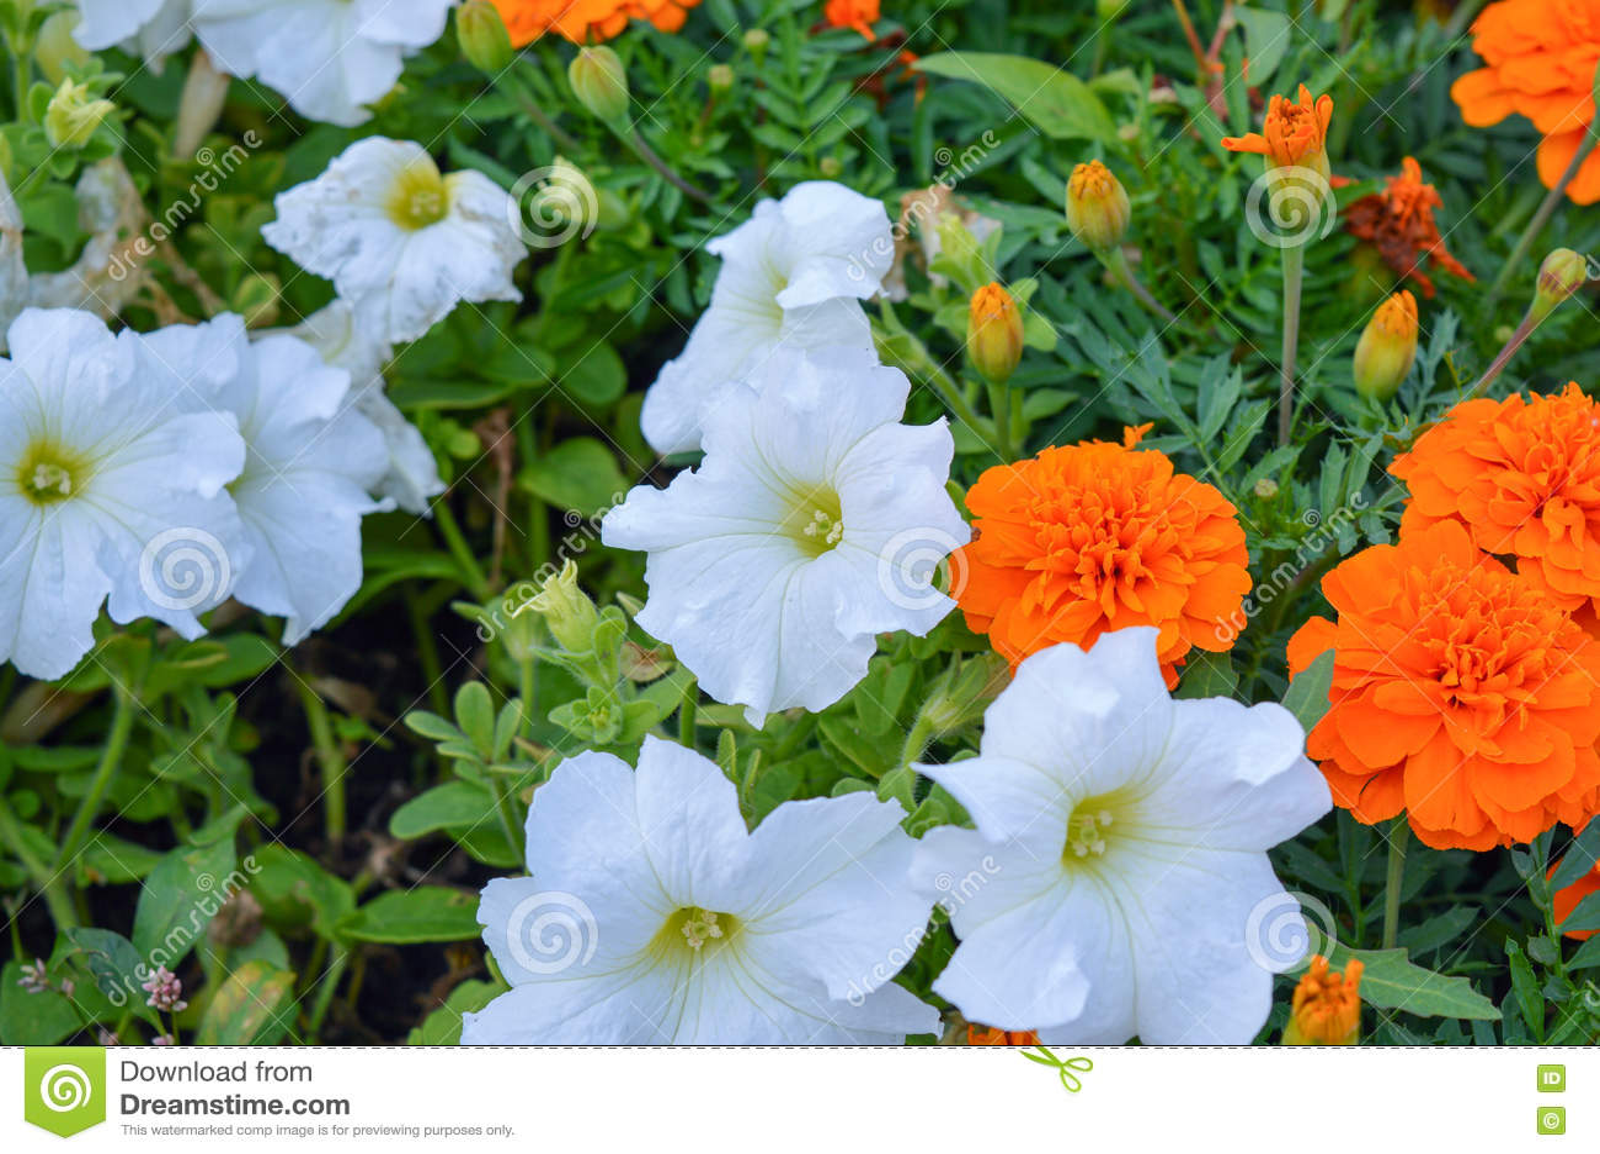 White petunia and orange marigold stock photo image of bright royalty free stock photo izmirmasajfo Choice Image